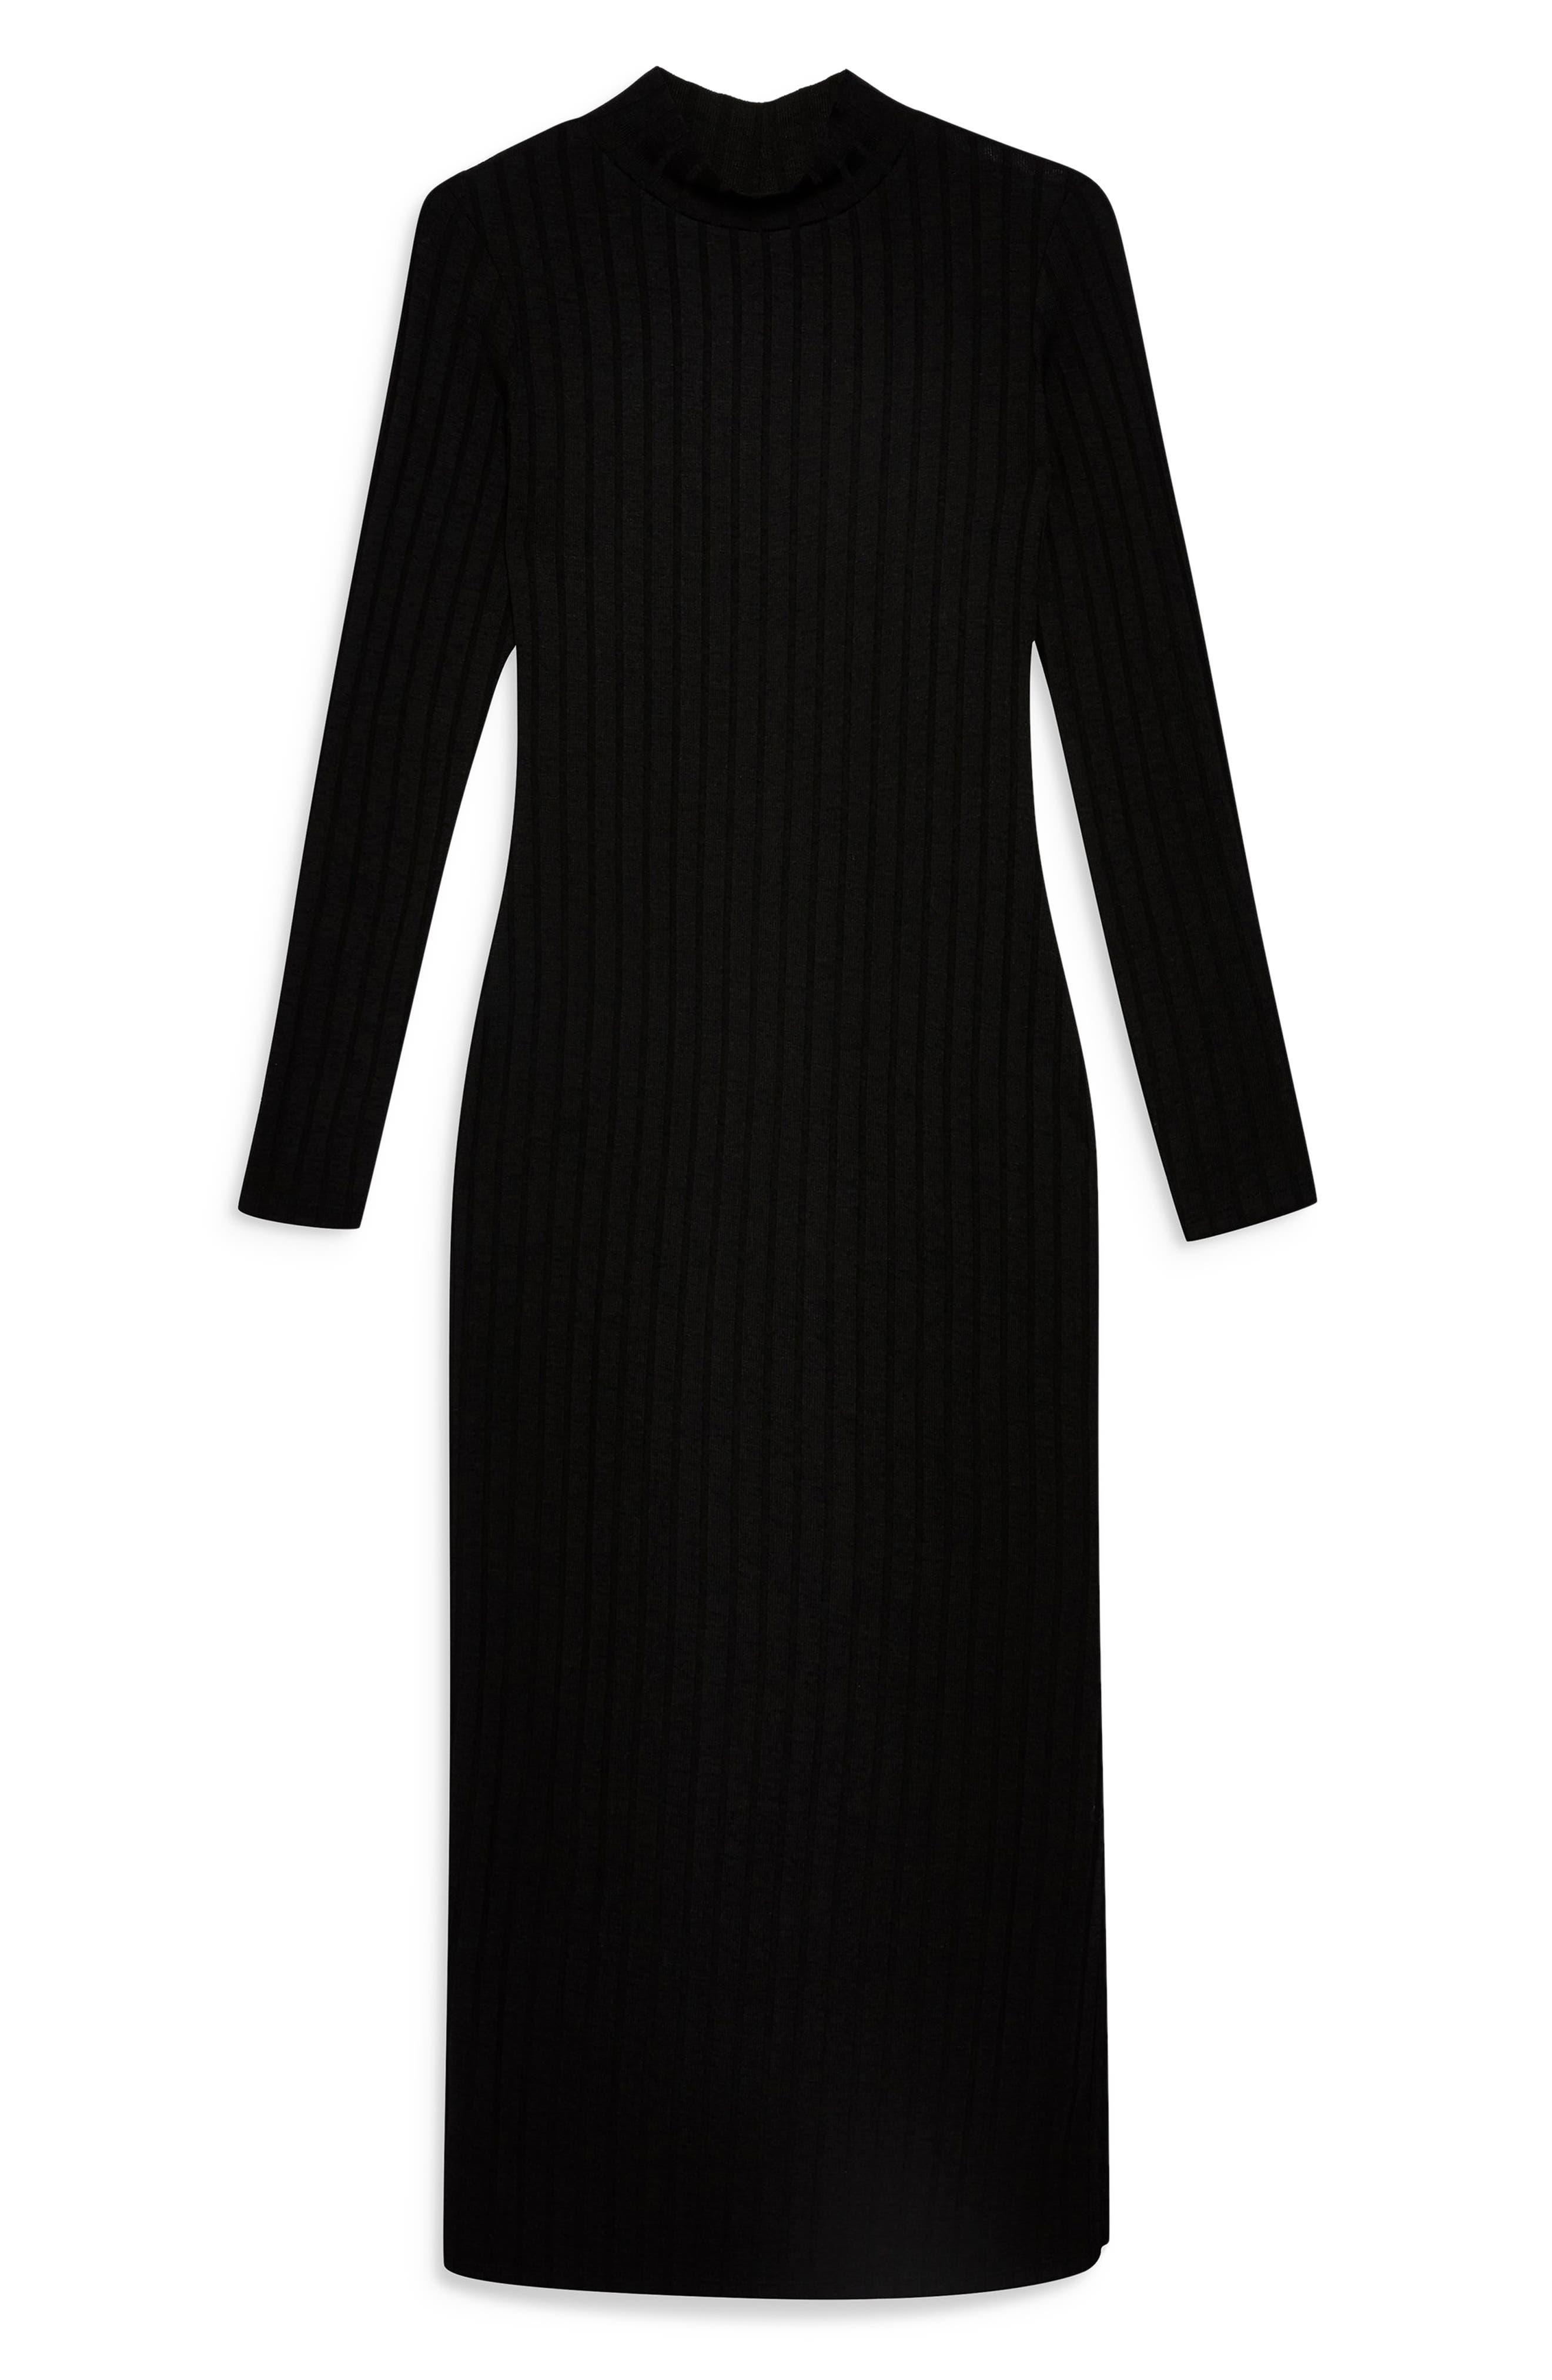 TOPSHOP, High Neck Ribbed Midi Dress, Alternate thumbnail 5, color, BLACK